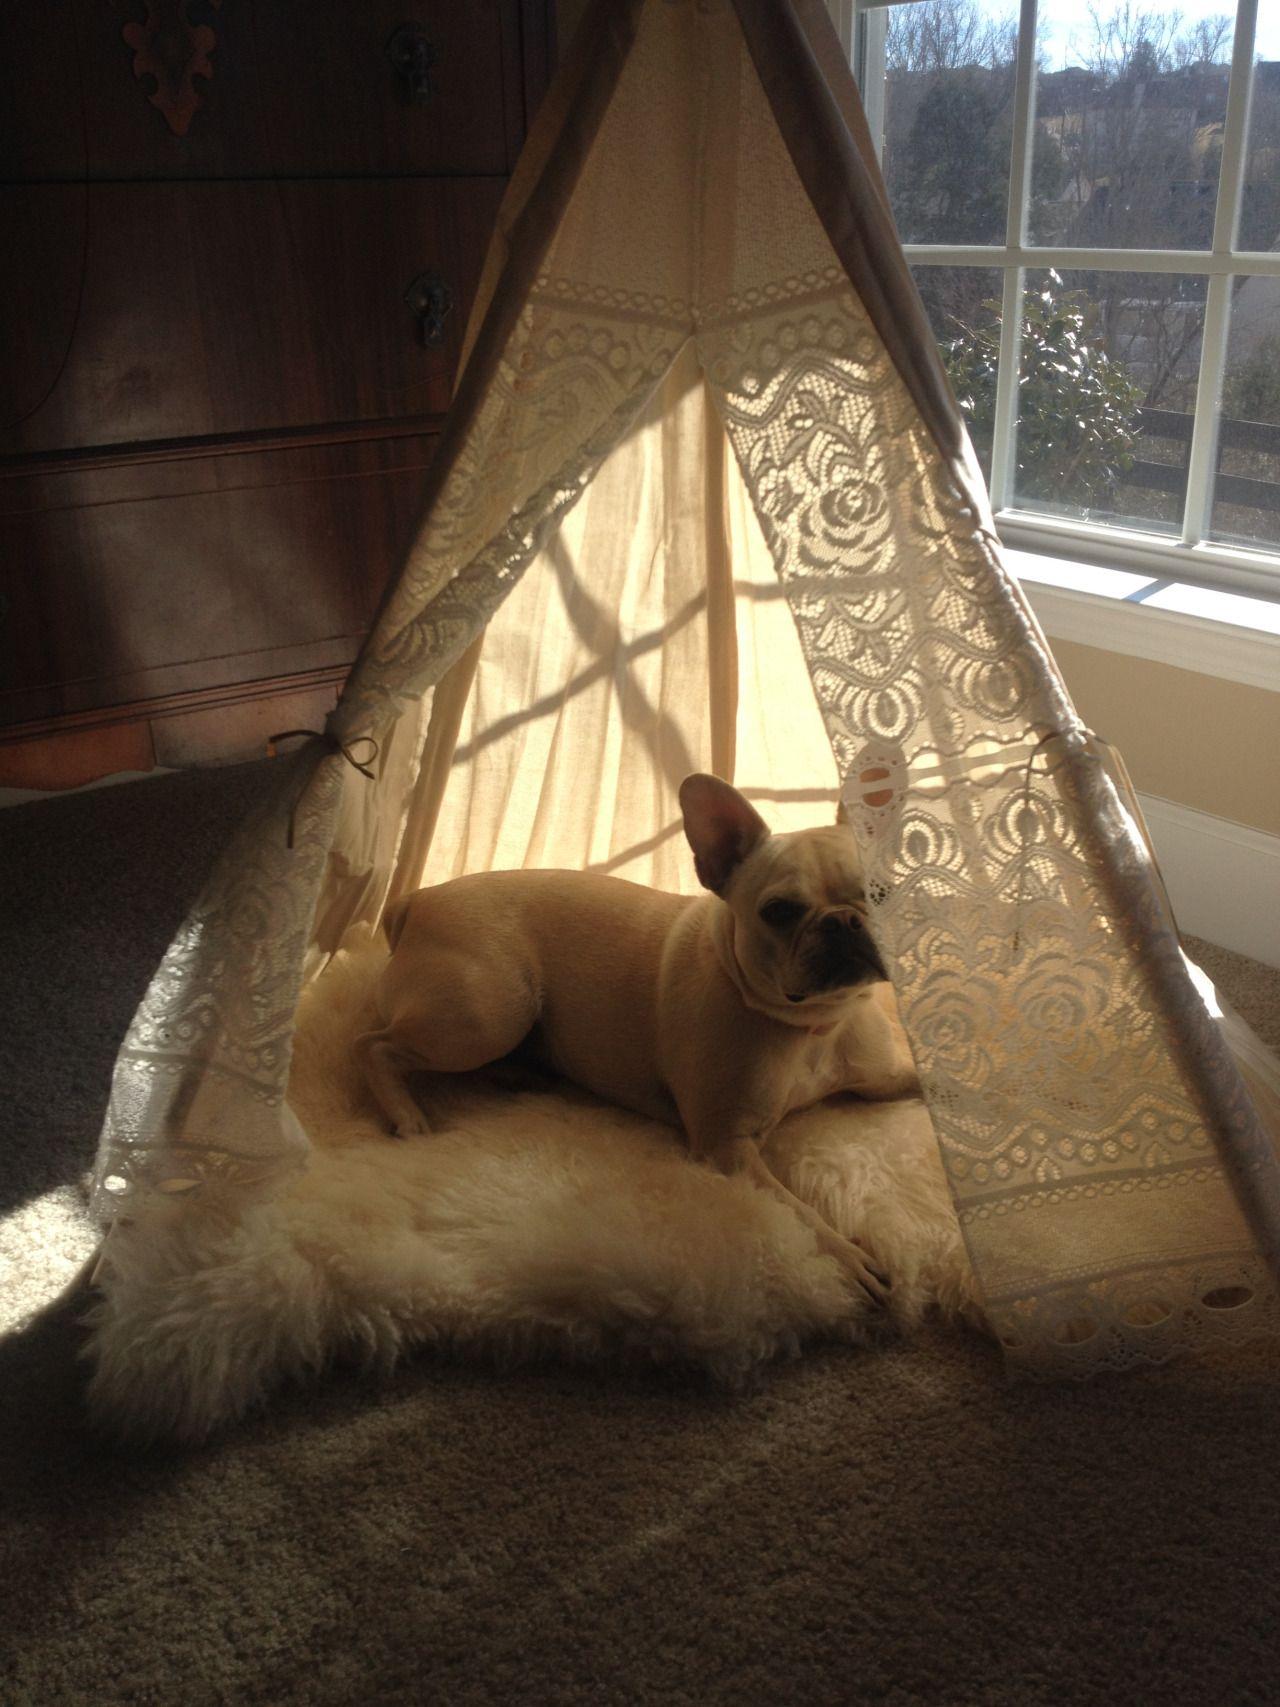 LuLu is 1 and lives in Nashville. She enjoys enchanted